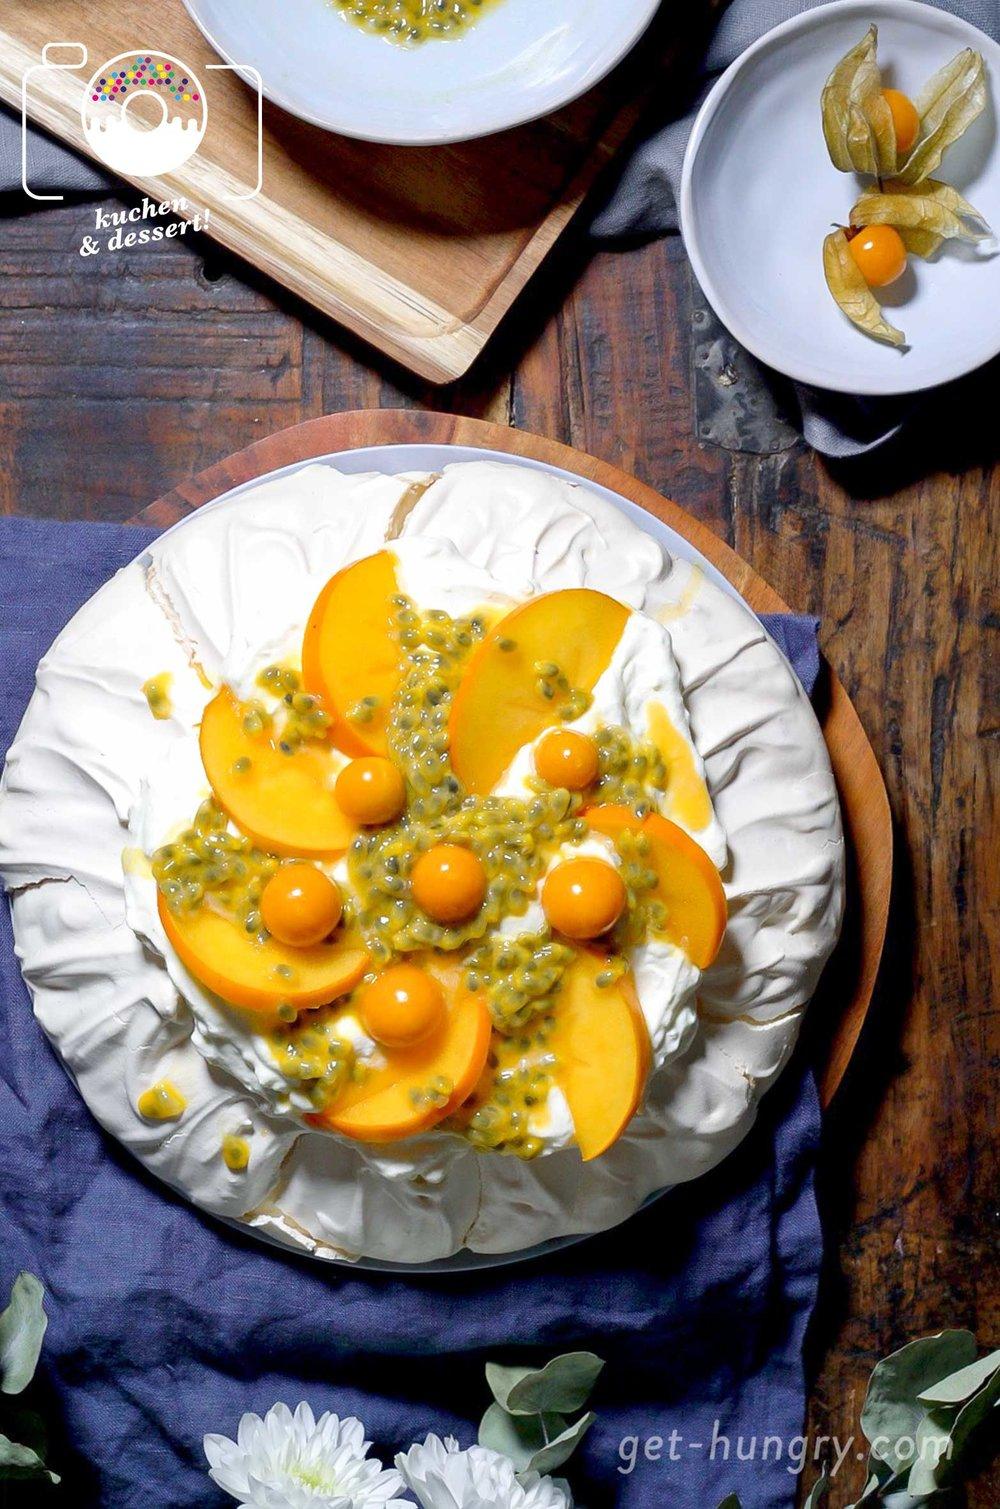 Klassische Pavlova Schritt Fur Schritt Zum Weissen Dessert Traum